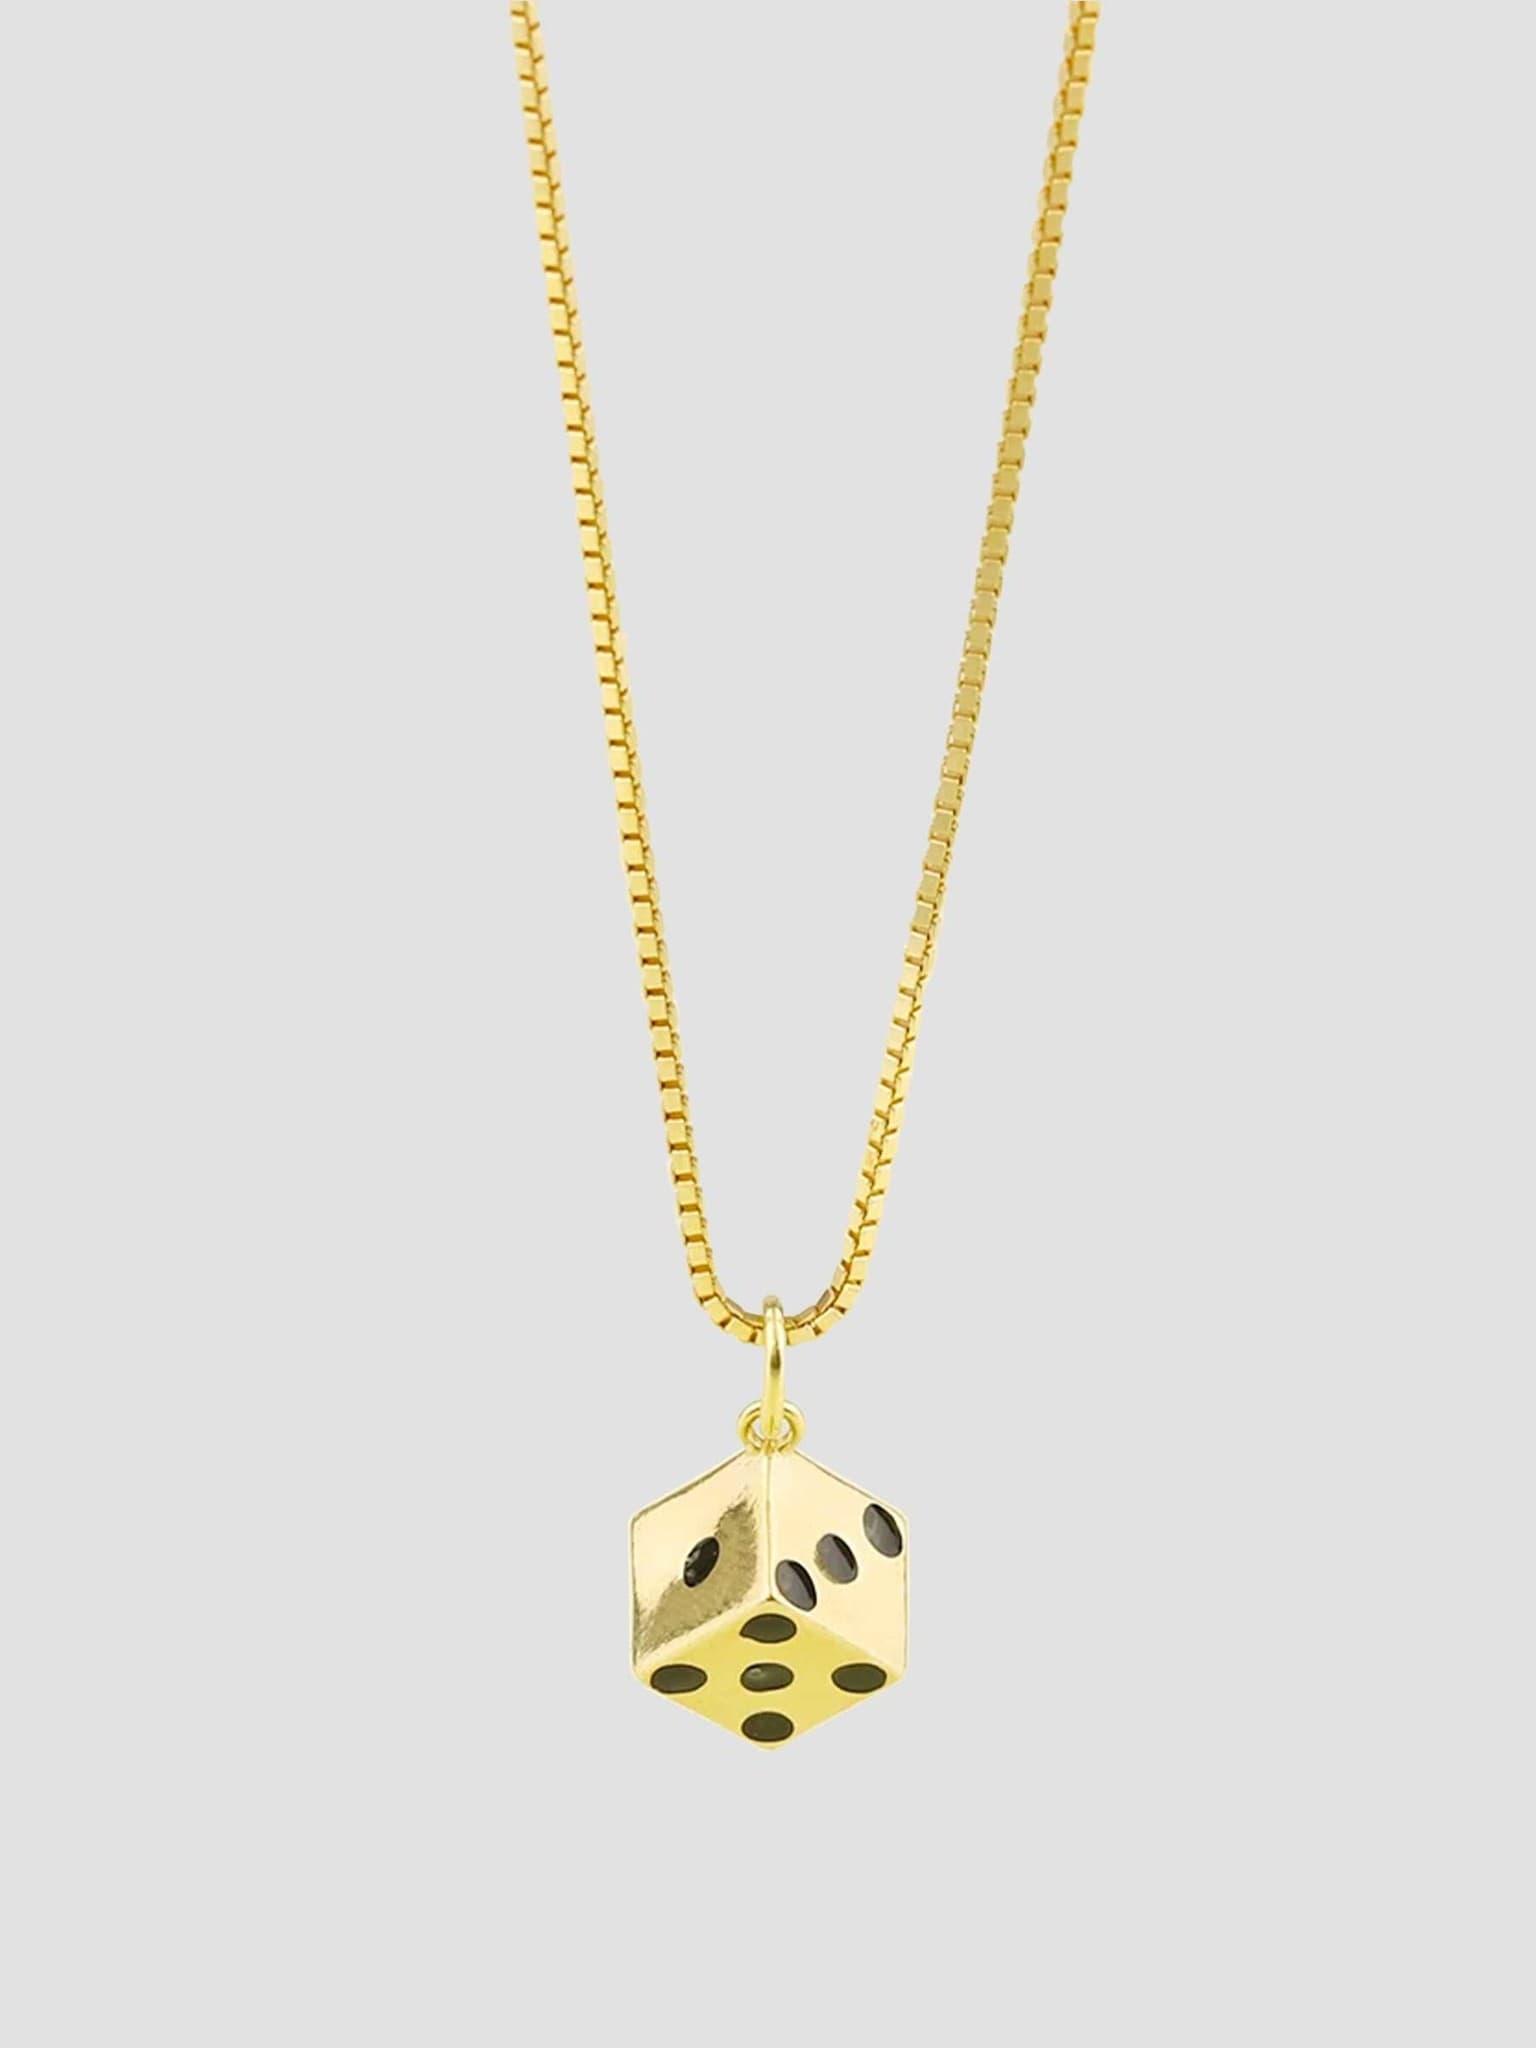 Dice Necklace 55cm 14k Gold